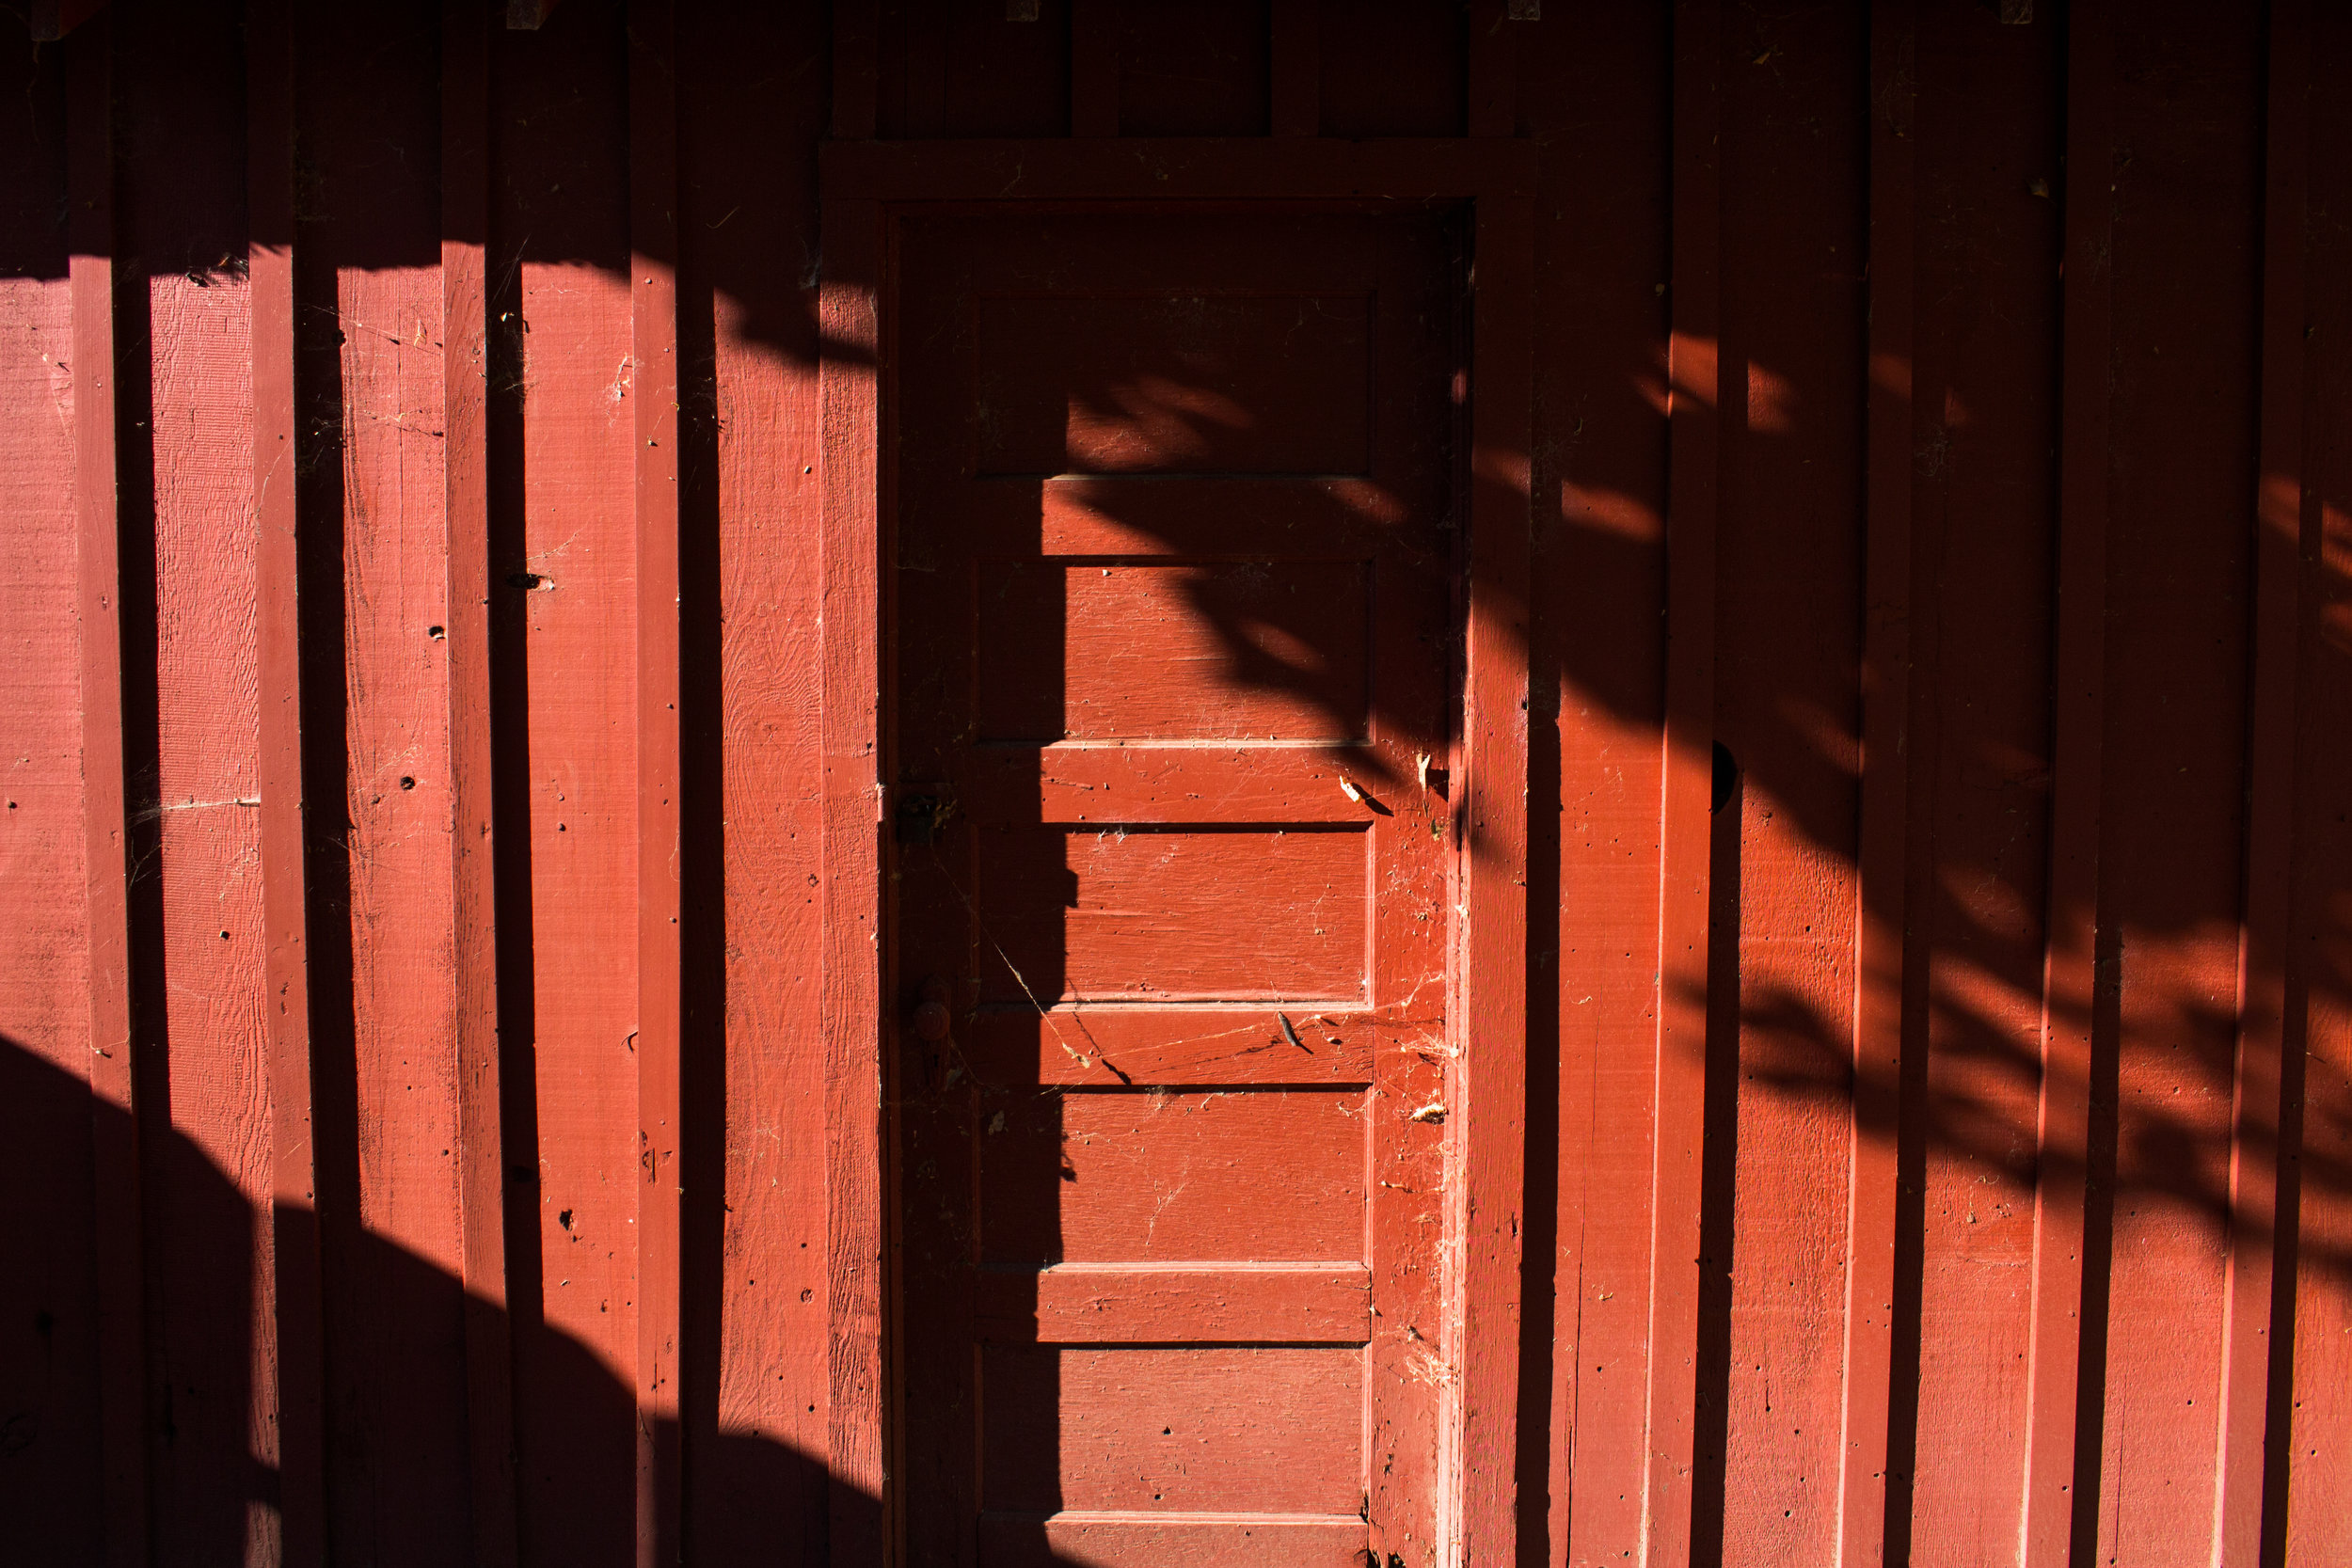 brightreddoor.jpg